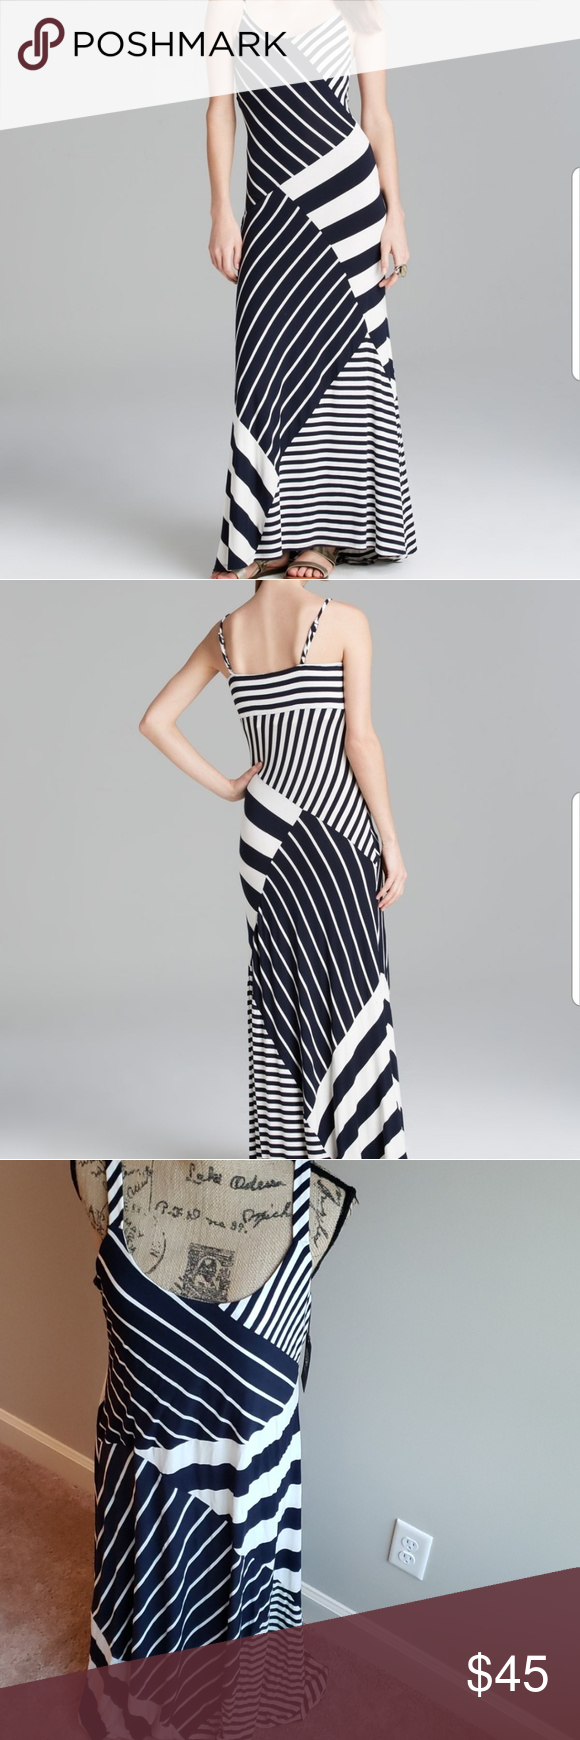 Vince Camuto Blue And White Maxi Dress White Maxi Dresses Clothes Design White Maxi [ 1740 x 580 Pixel ]